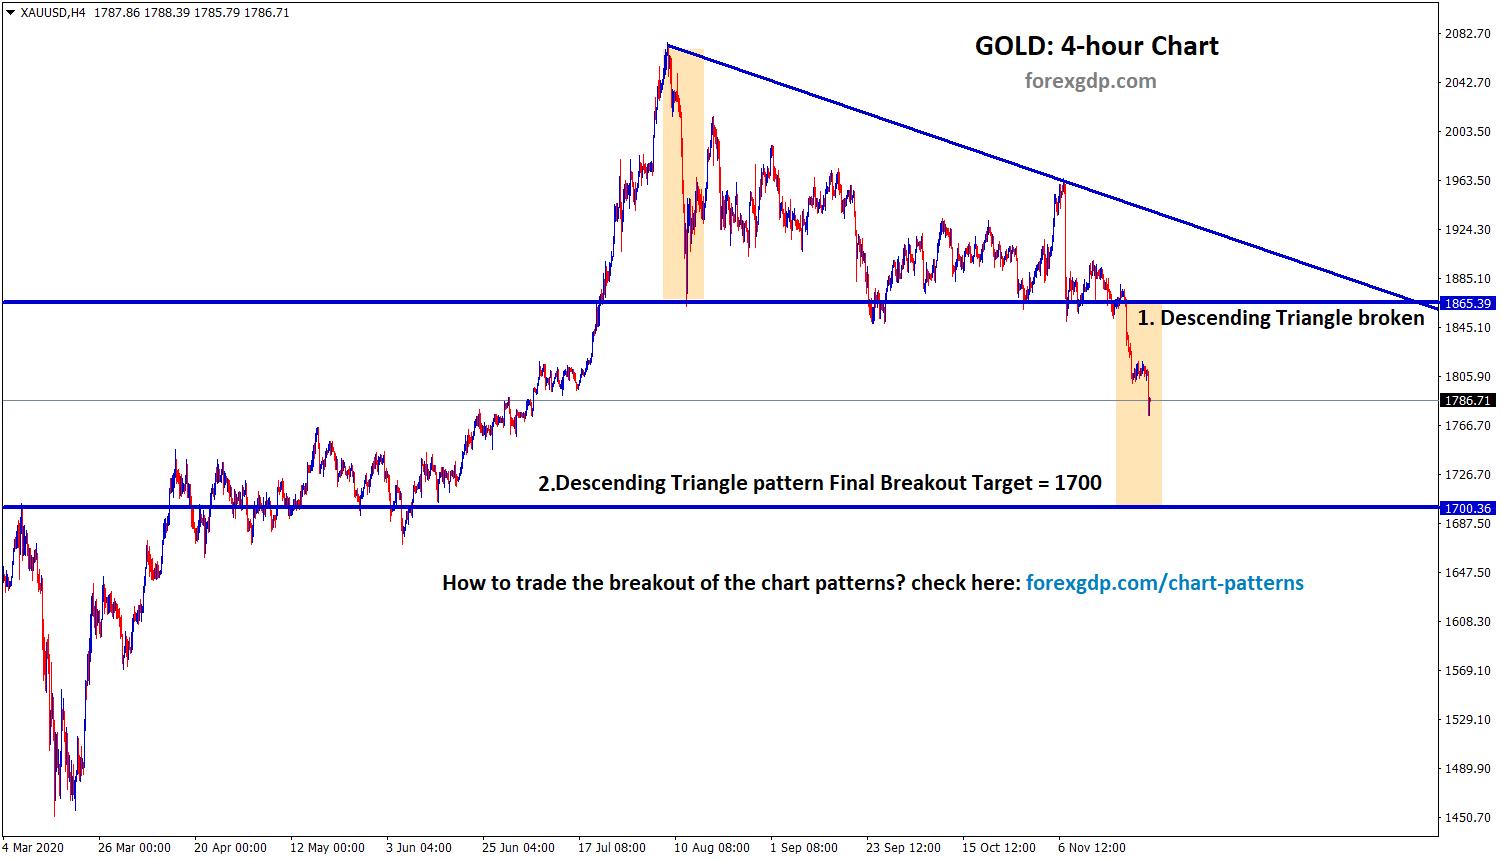 gold xauusd descending triangle breakout target